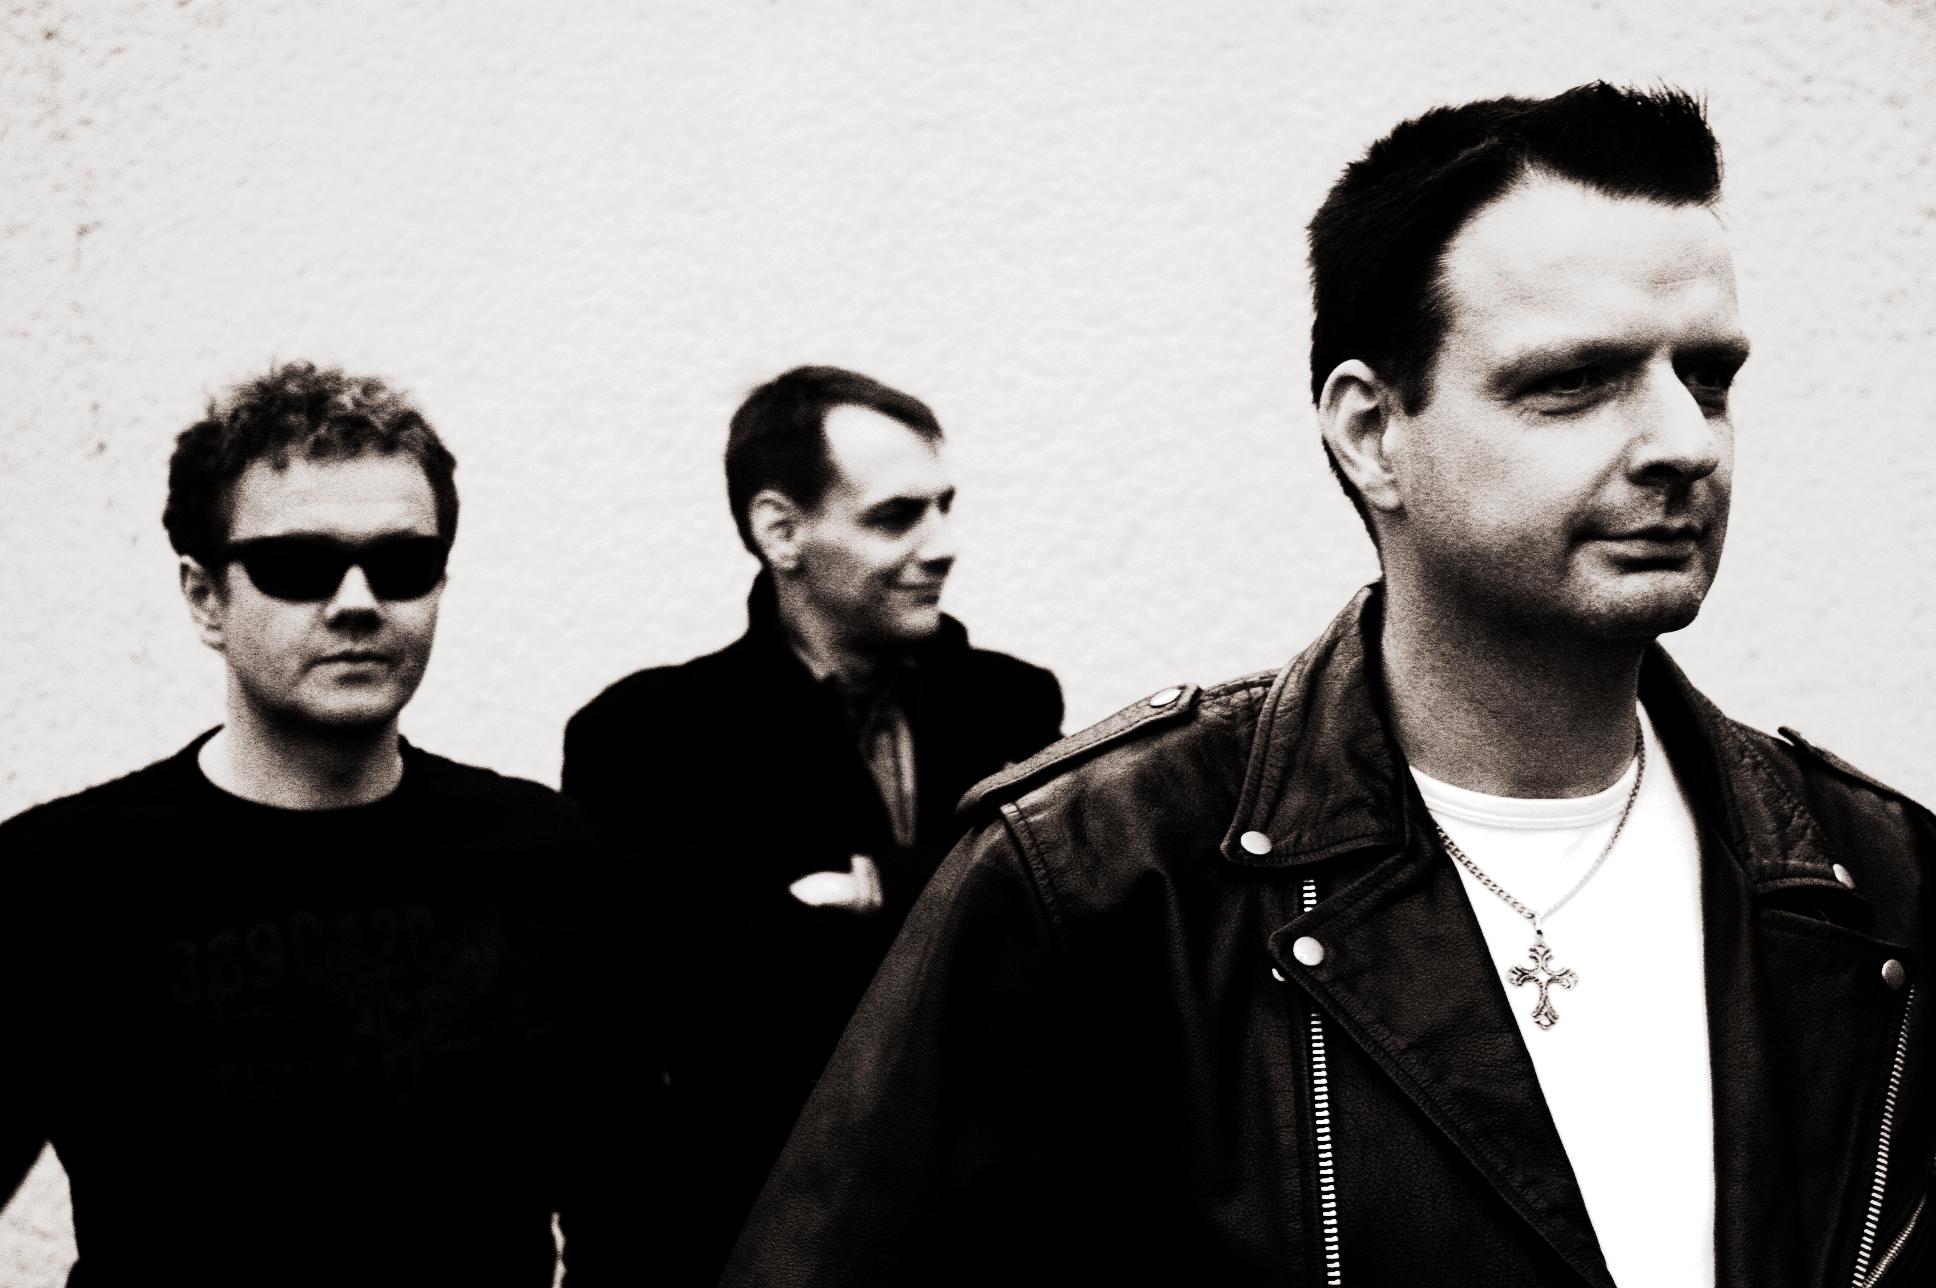 Pressefoto Depeche Mode Coverband - kleine Besetzung